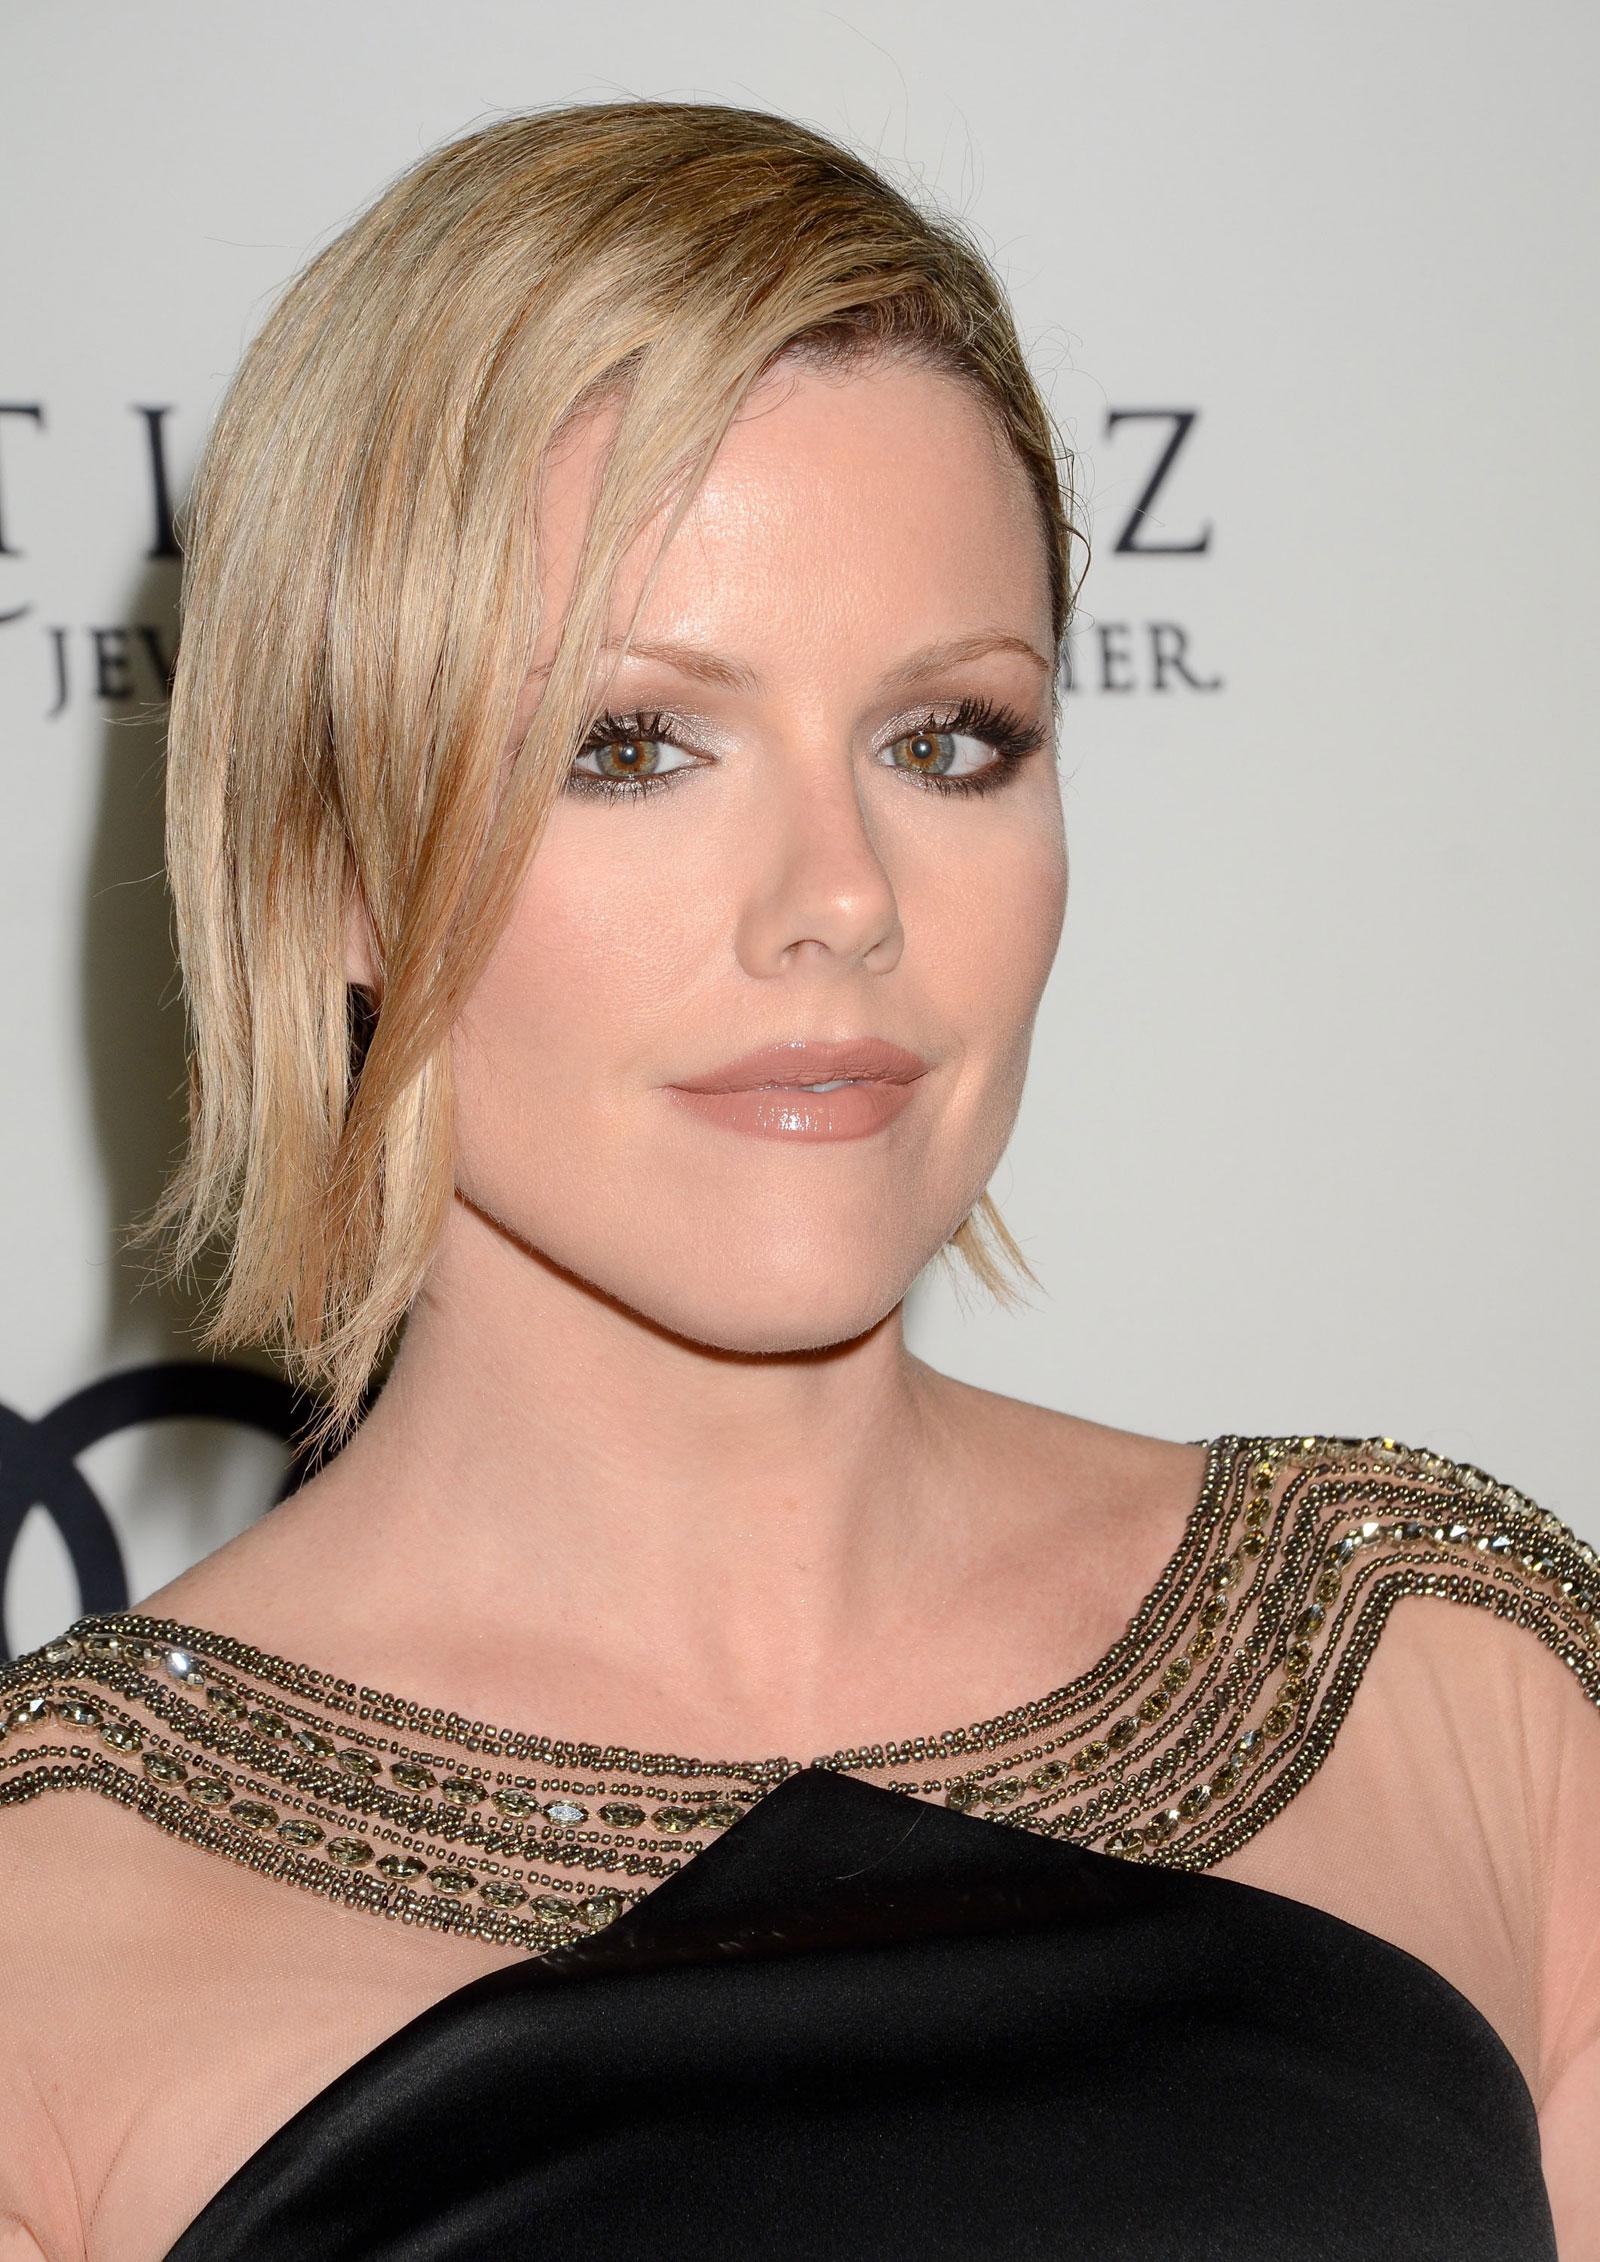 Kathleen Robertson at Audi Celebrates The 2012 Golden Globe Awards in West Hollywood - HawtCelebs